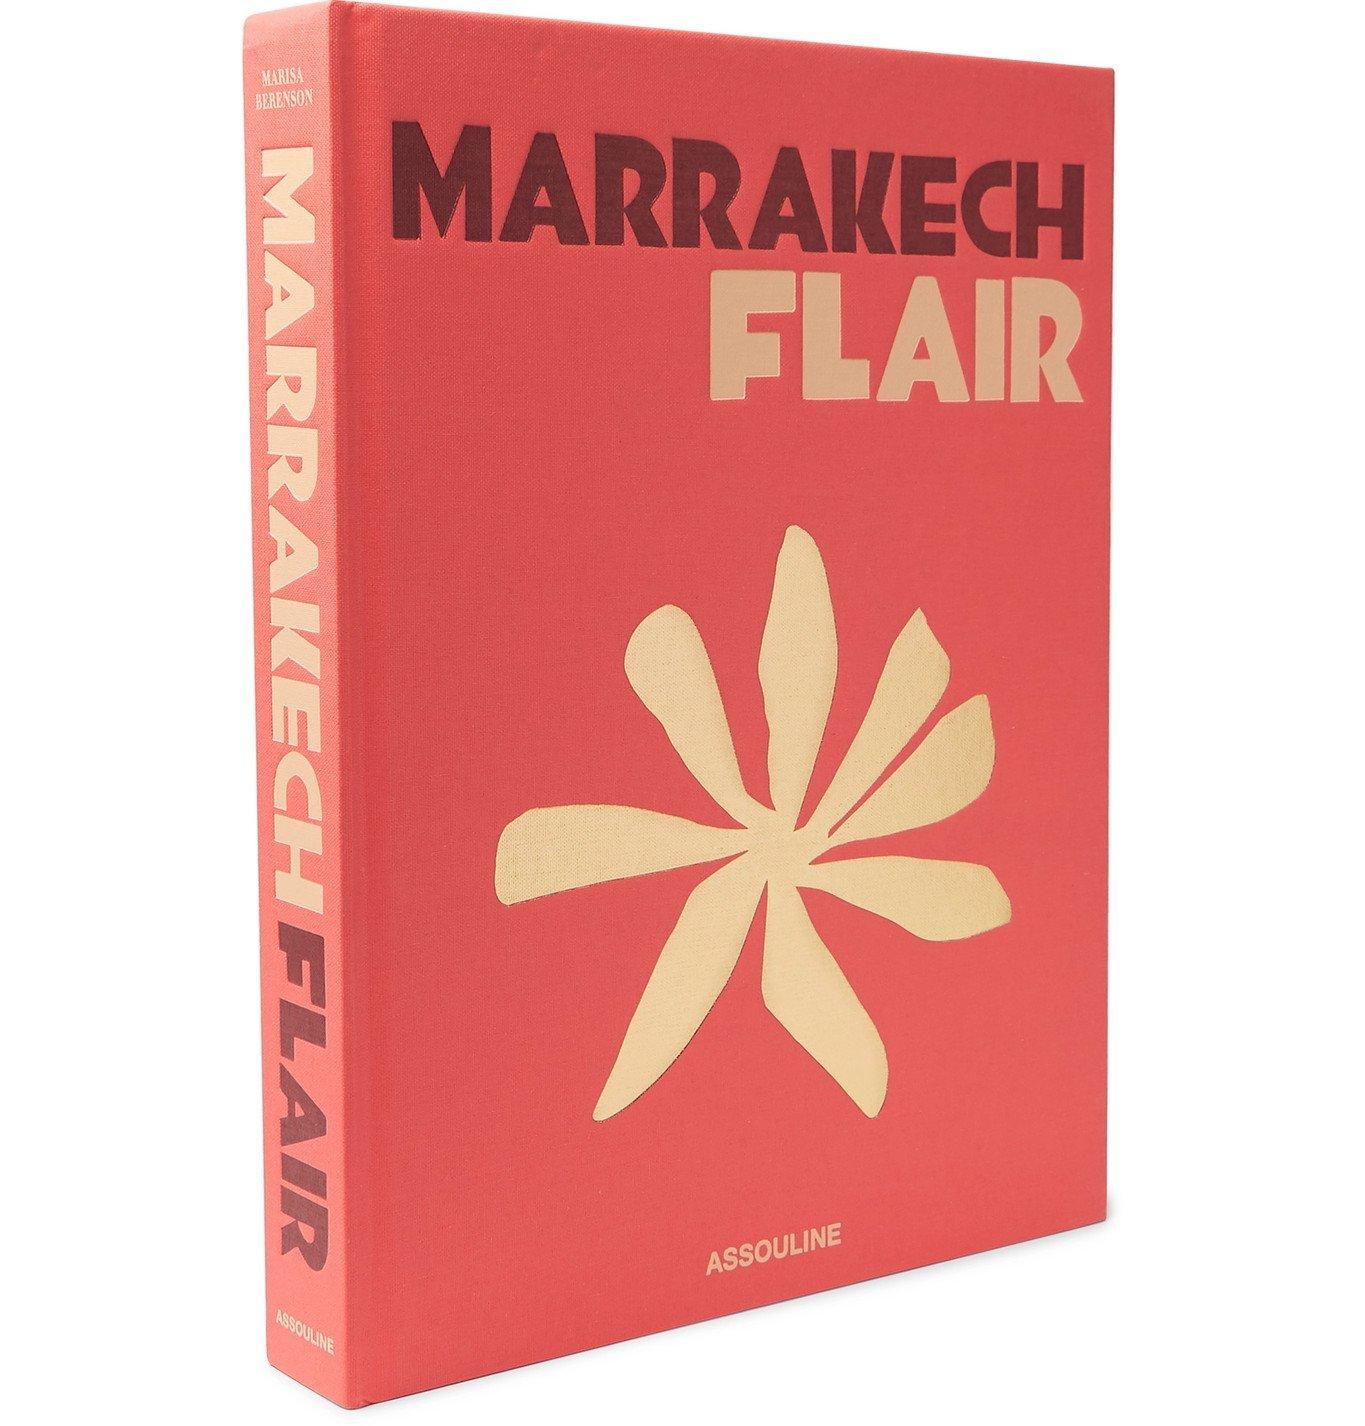 Photo: Assouline - Marrakech Flair Hardcover Book - Red